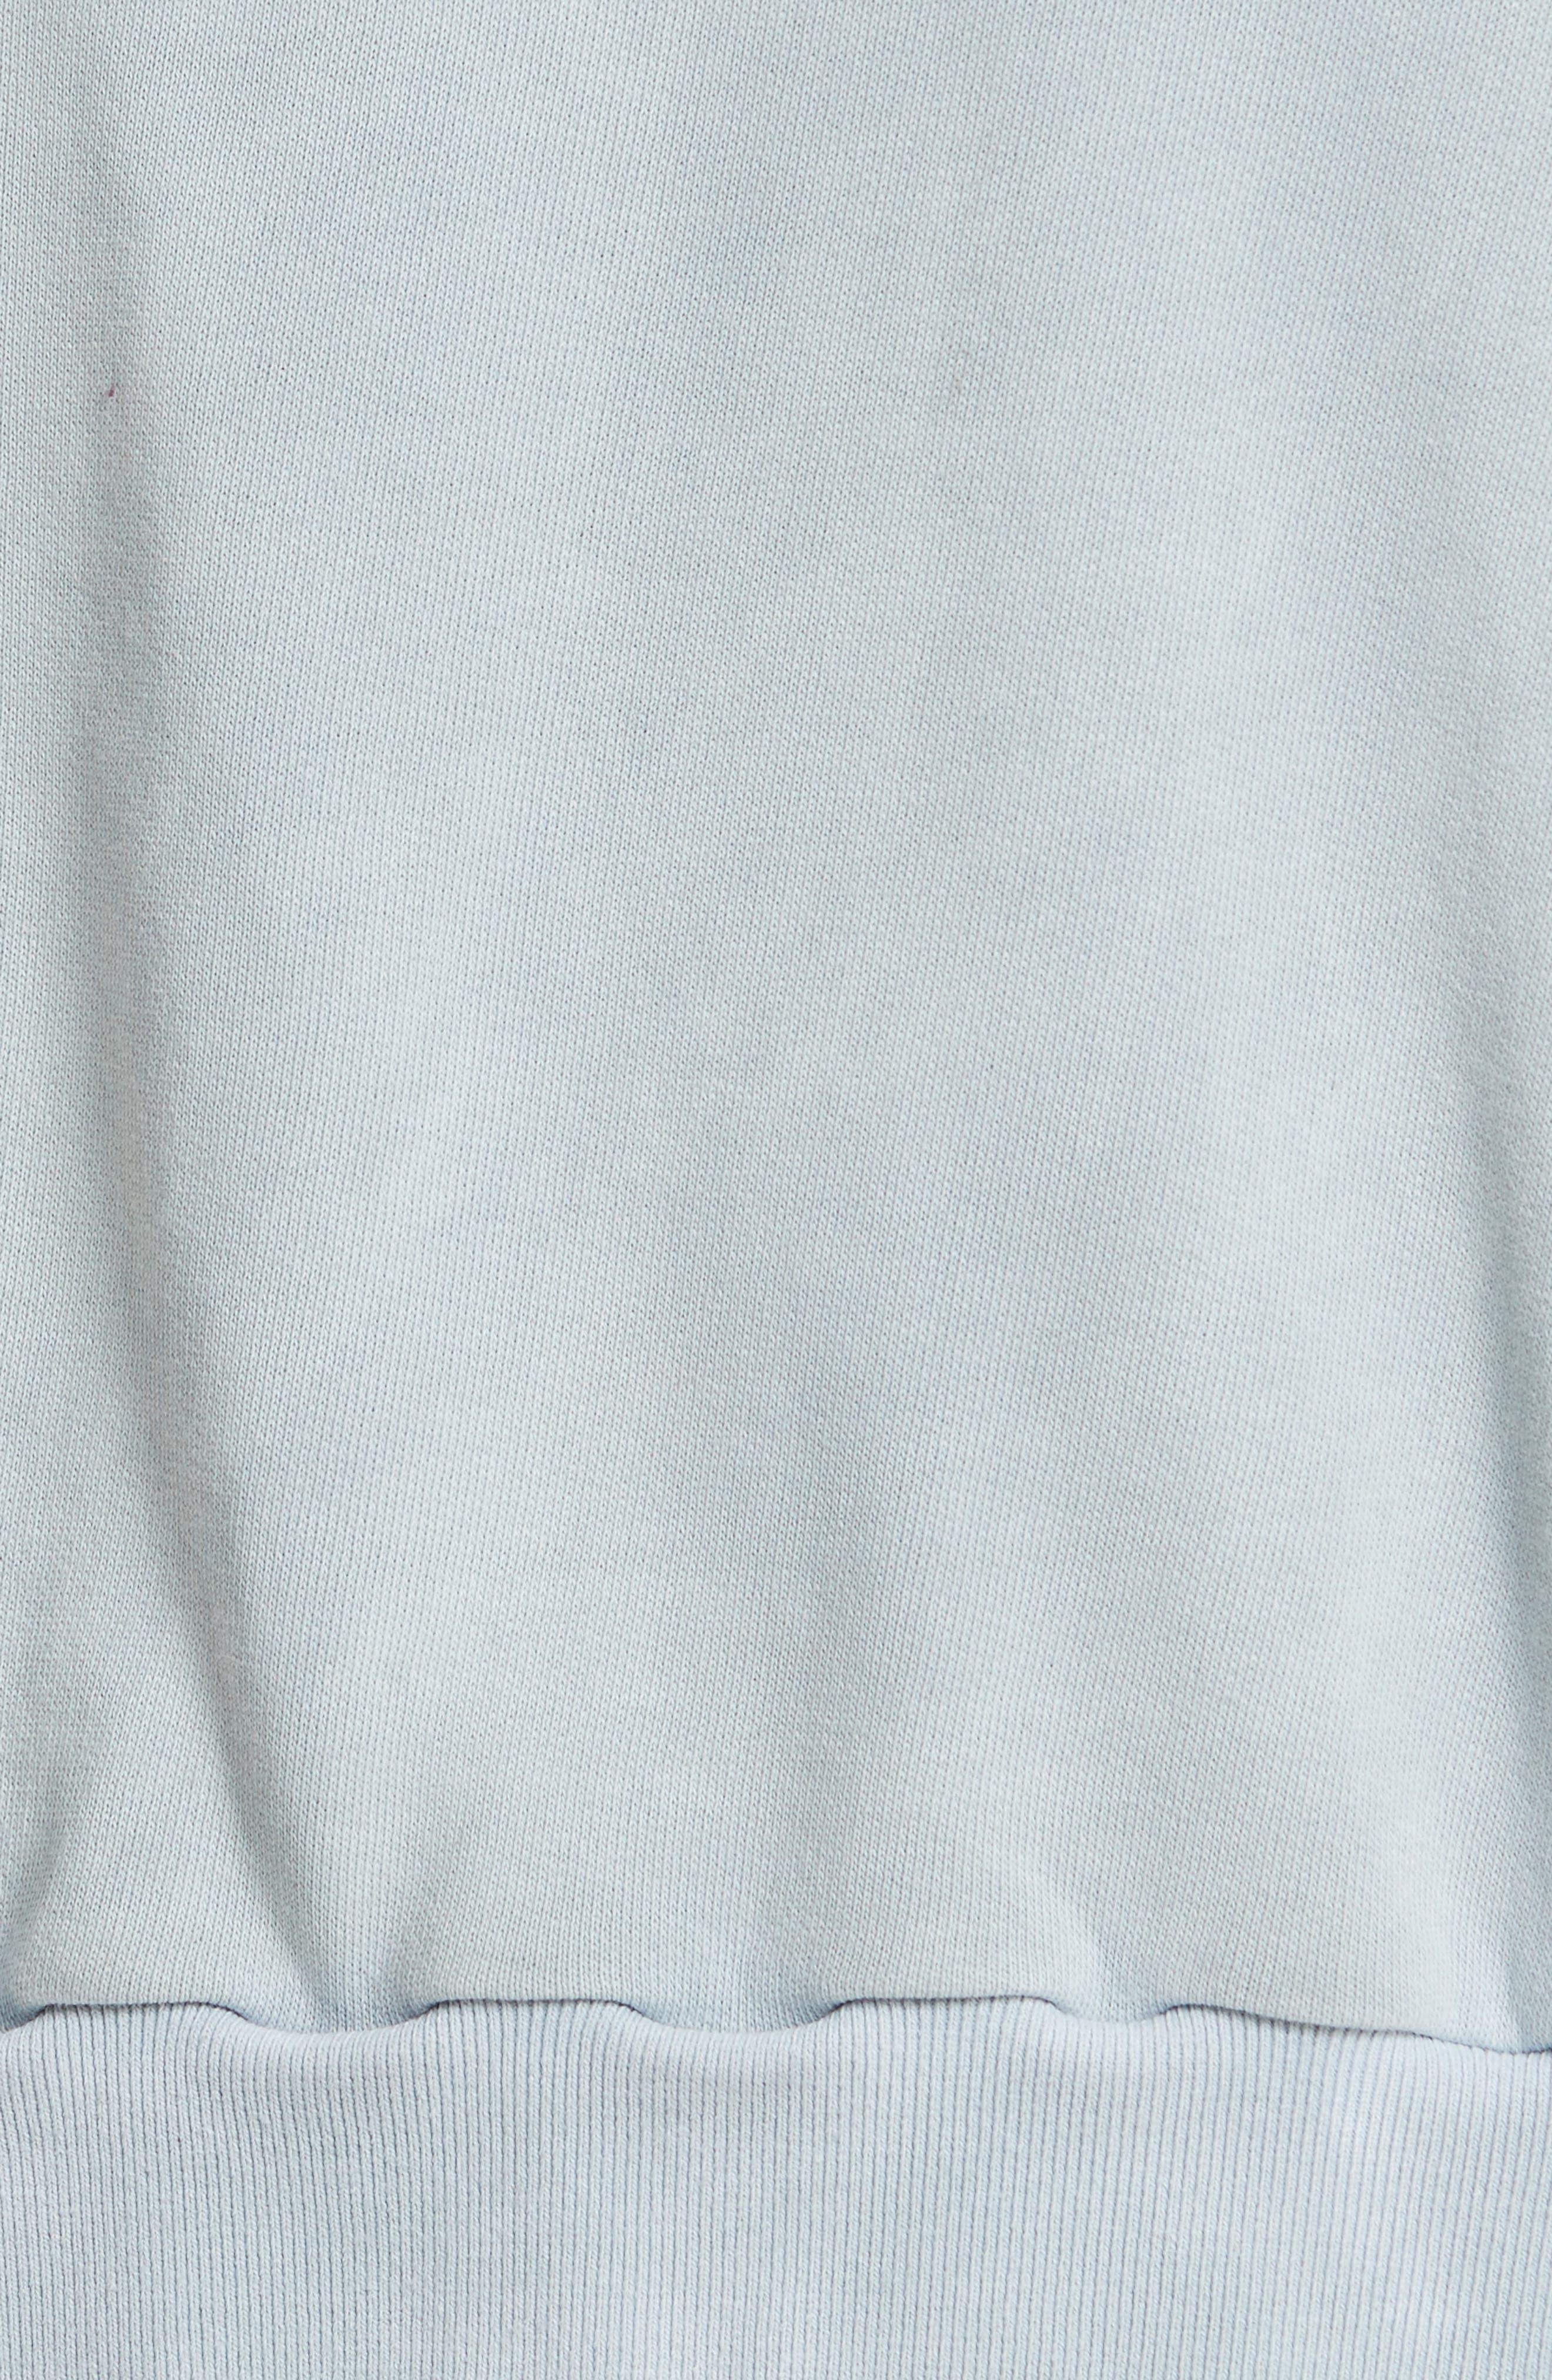 Alternate Image 5  - Rebecca Taylor Balloon Sleeve Fleece Pullover